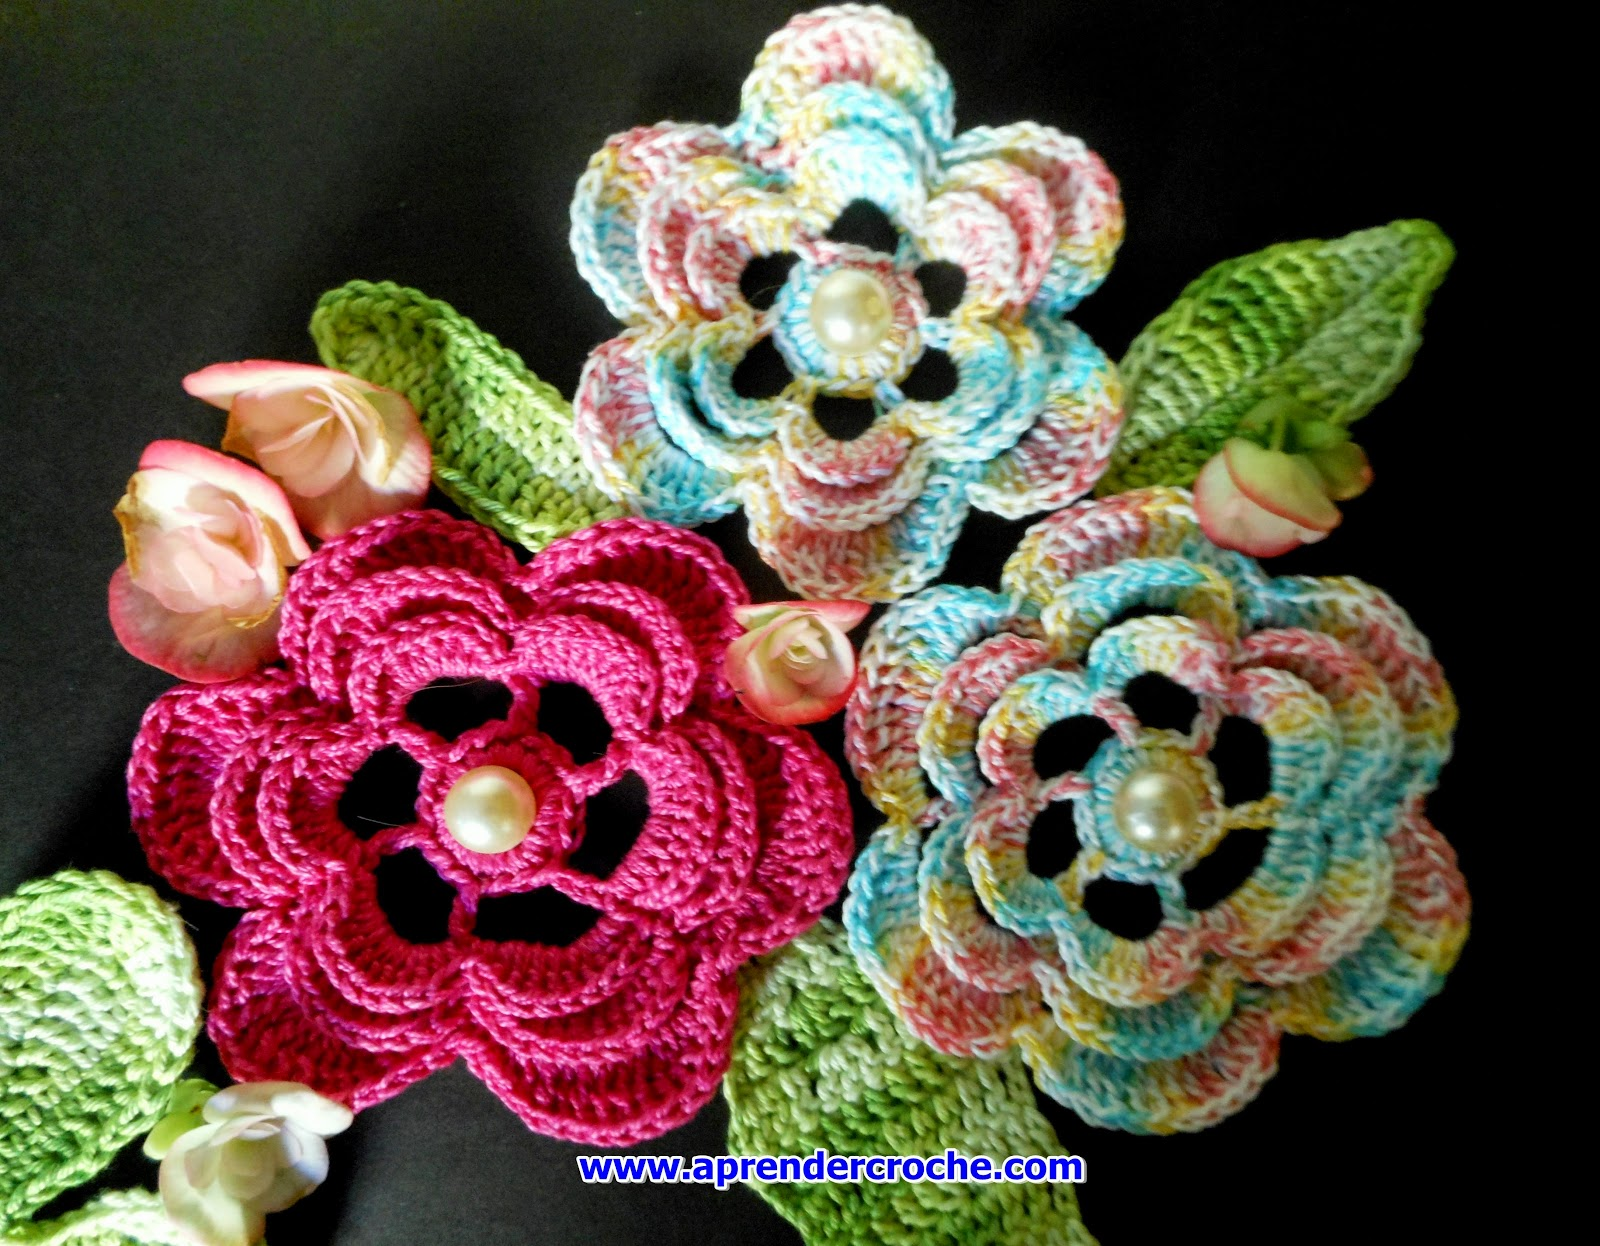 dvd 5 volumes flores aprender croche edinir-croche chan curso loja frete gratis